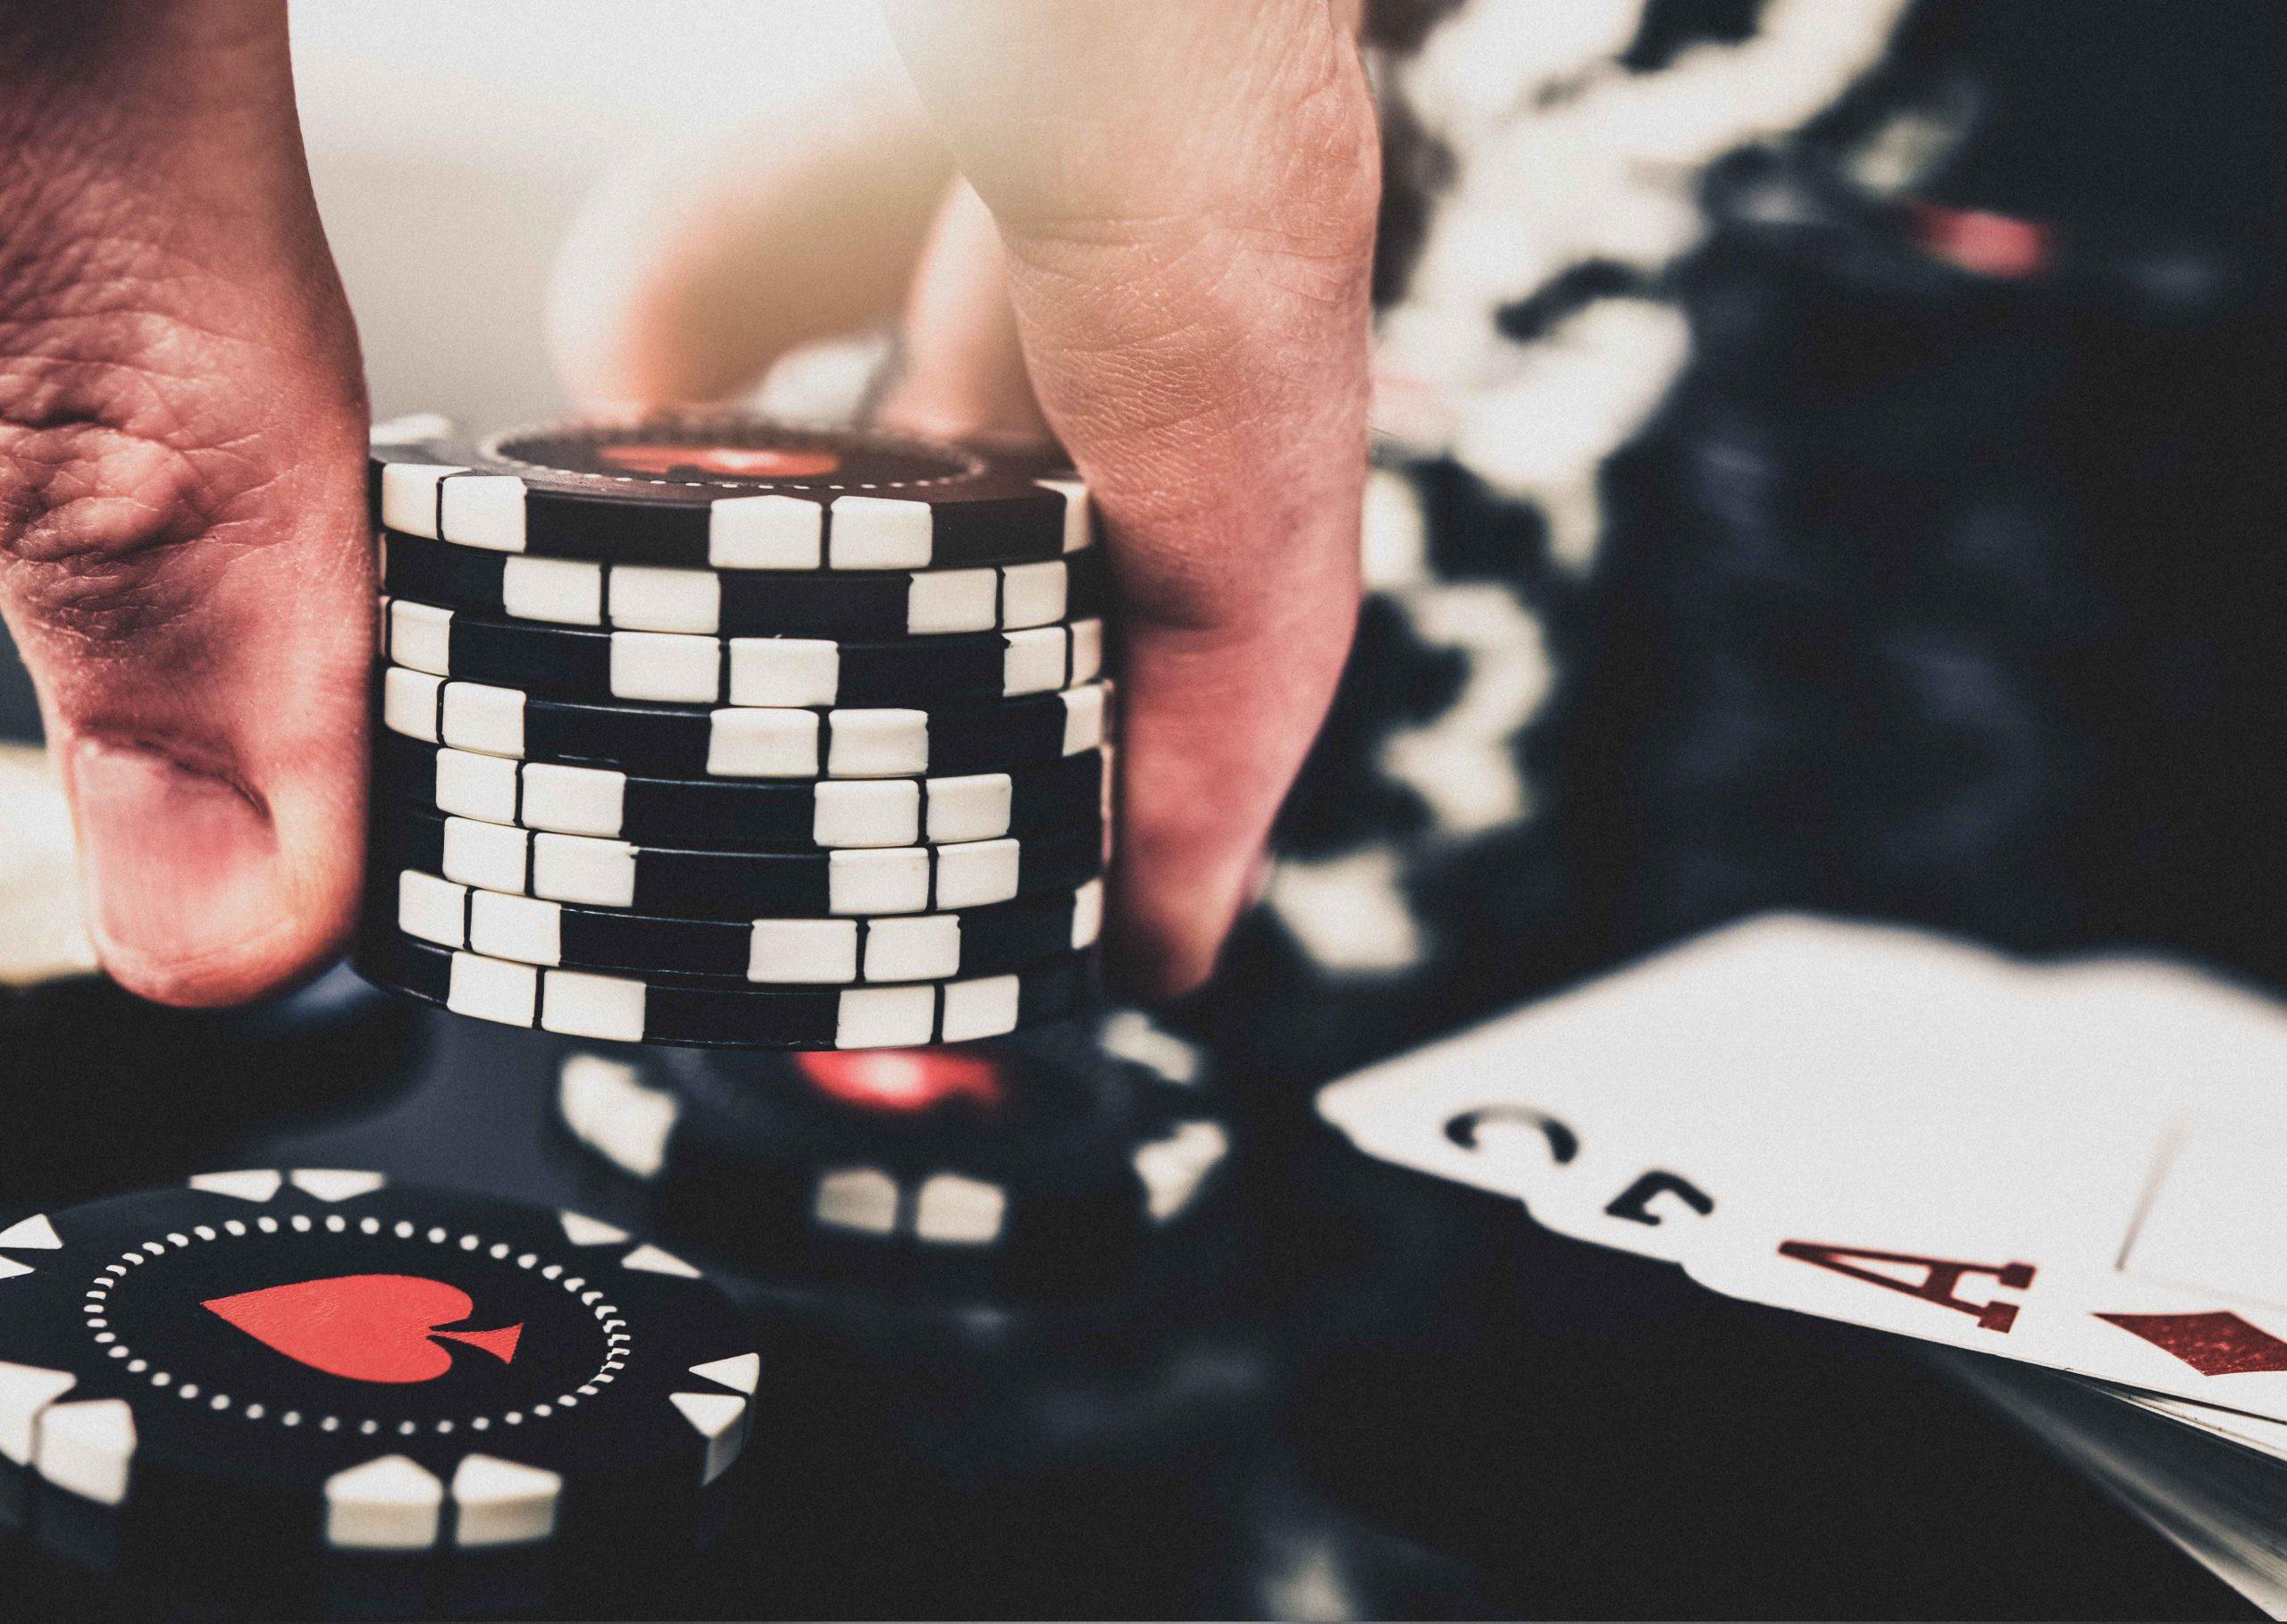 HolidayFlats24 in Saalbach Hinterglemm - Extras - Poker, Brettspiele